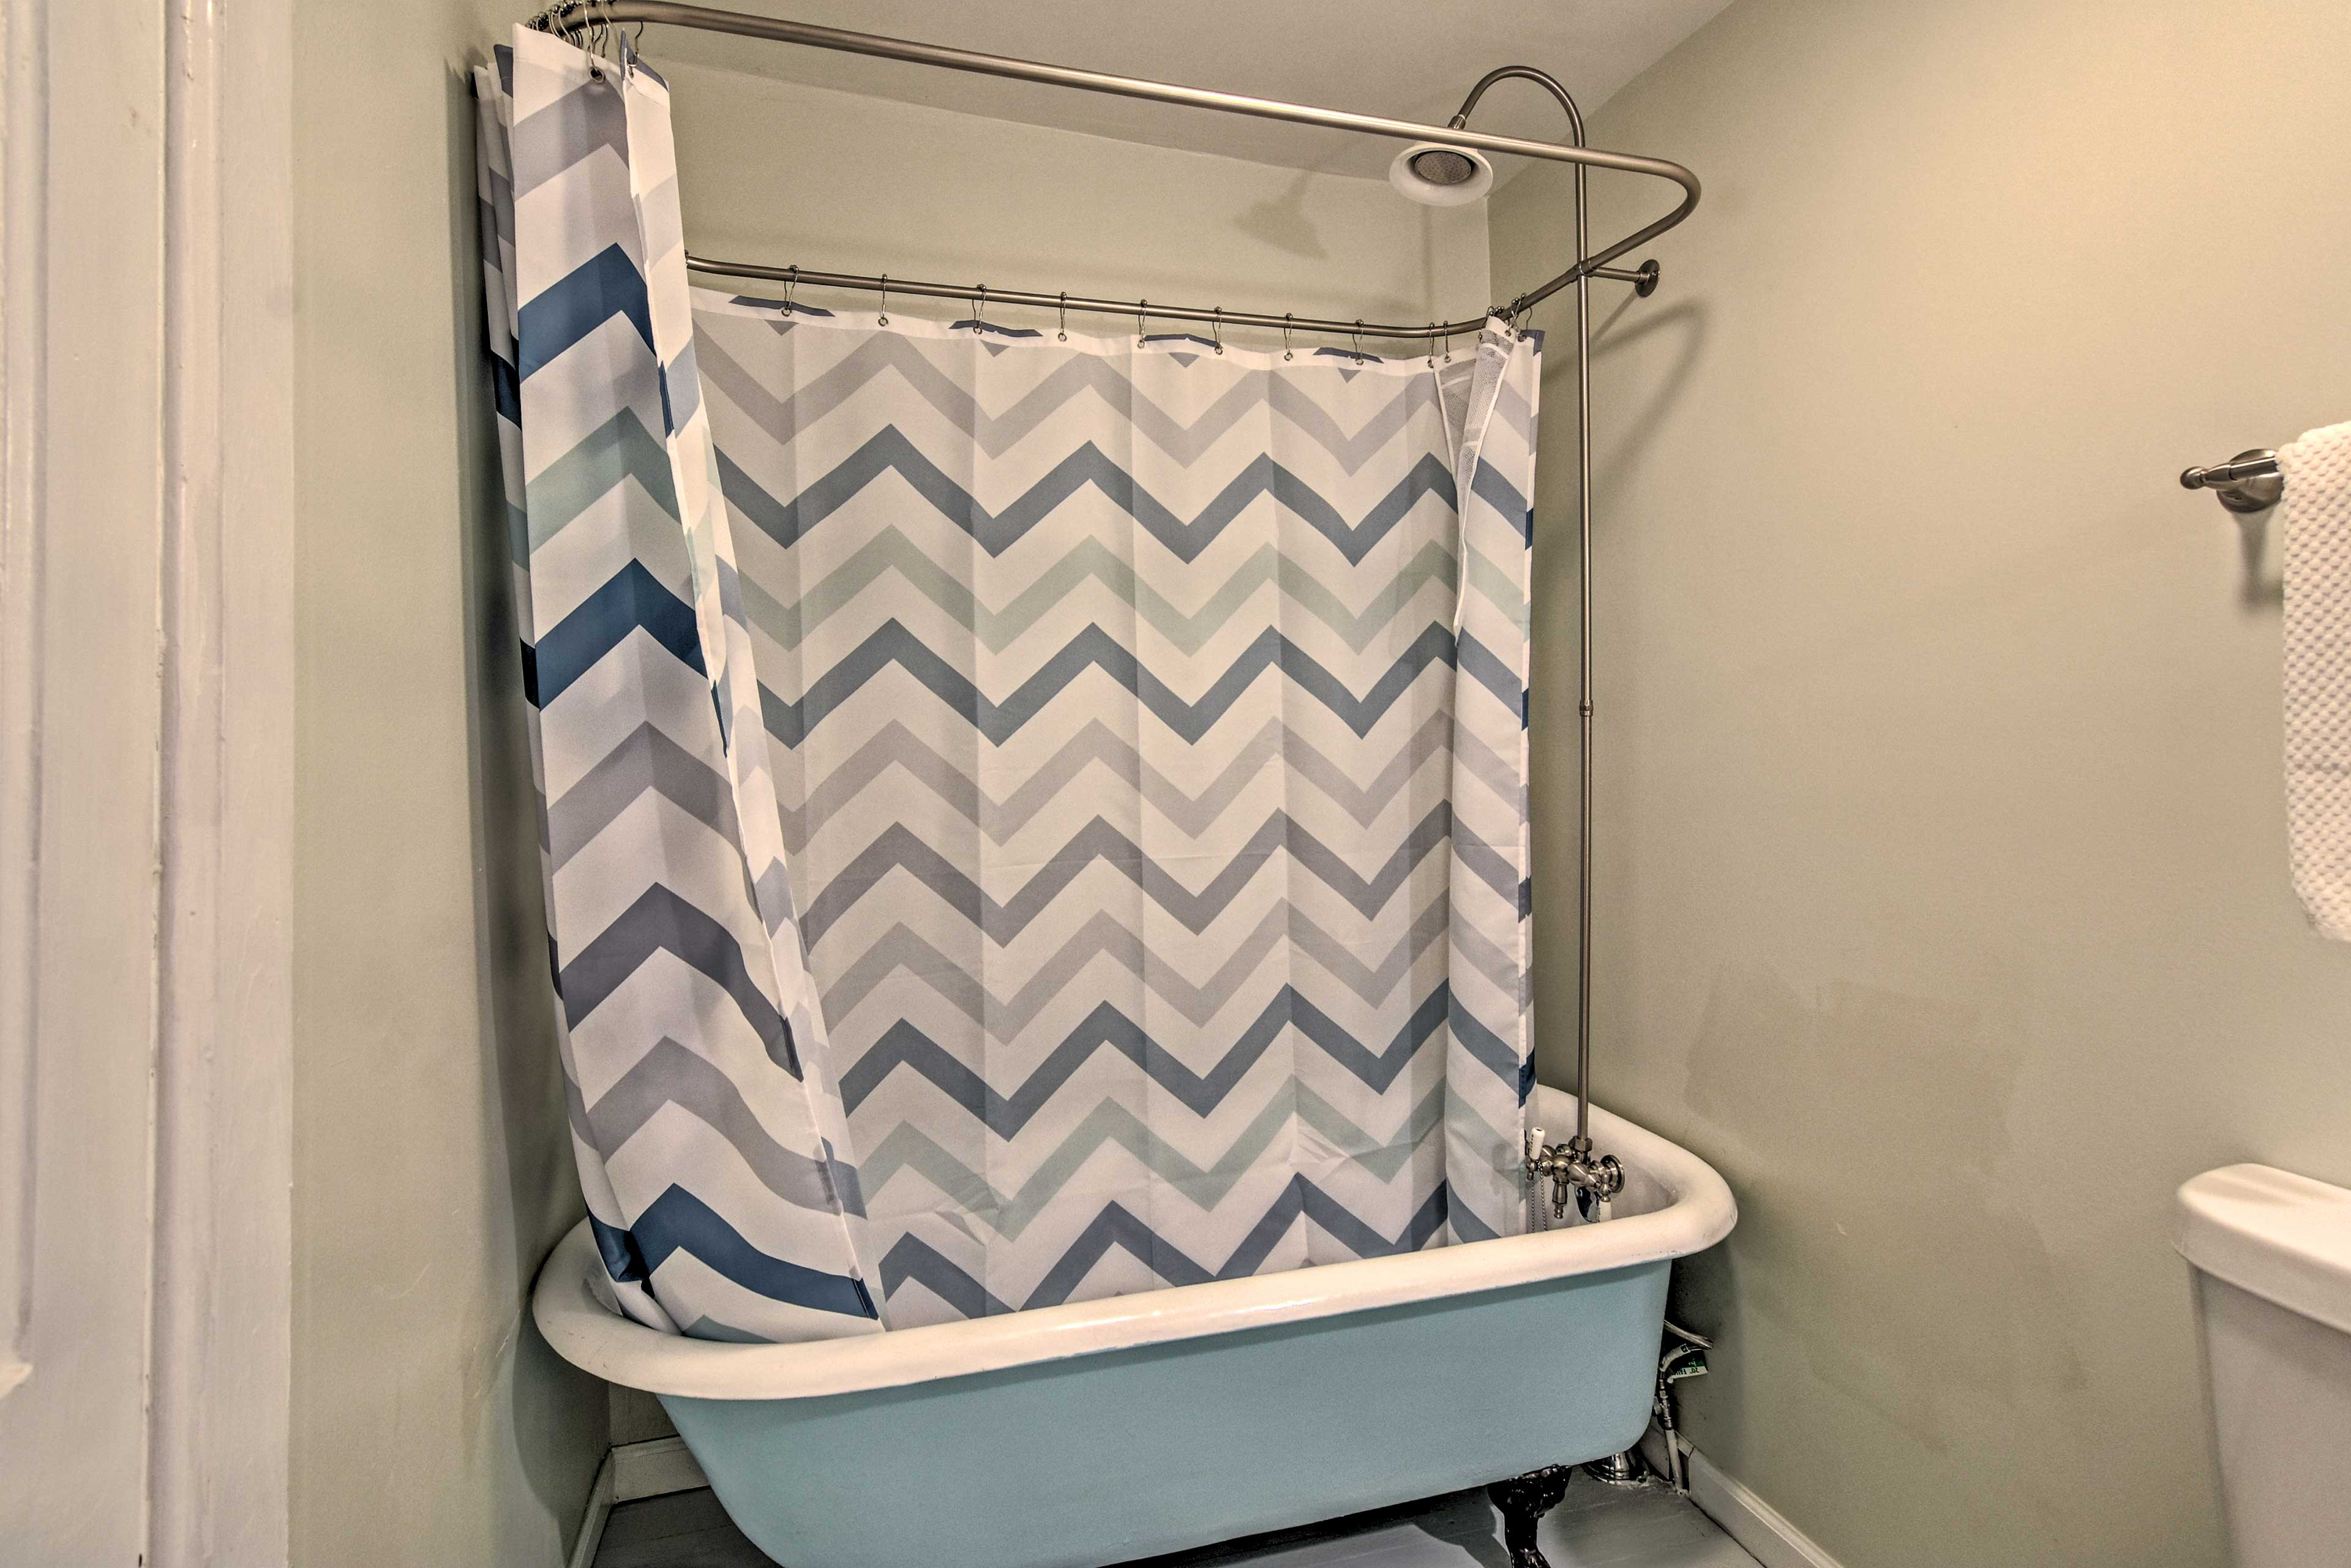 Take a shower or a bath in this bathroom.